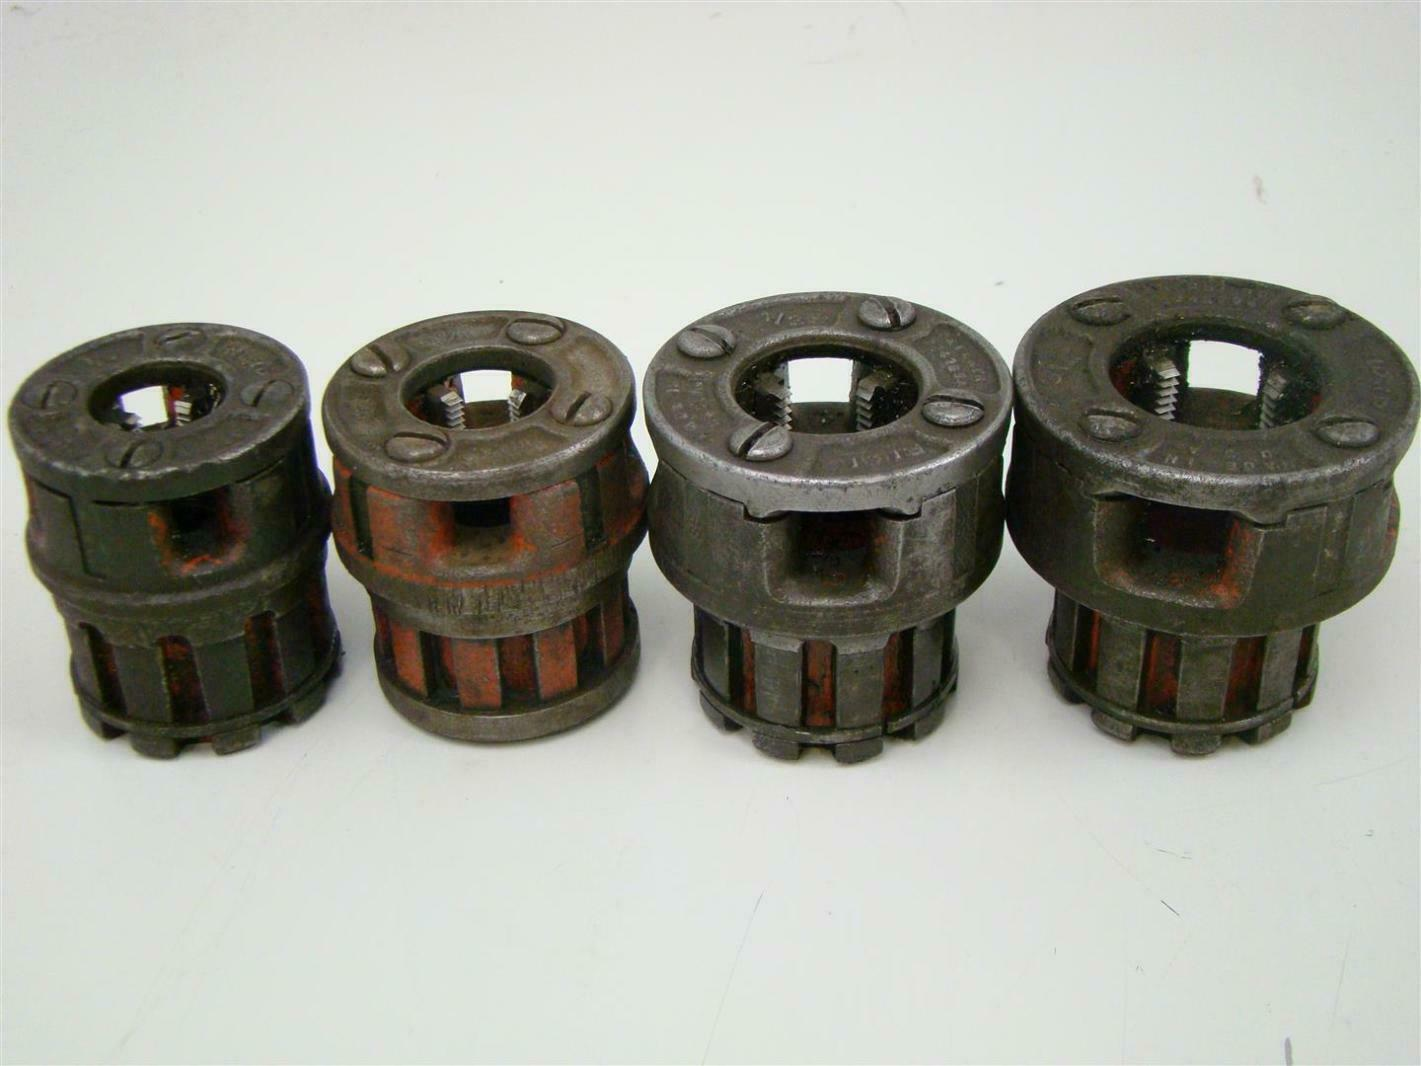 Ridgid Manual Pipe Threader 00-R WITH DIES 1/4 3/4 & Ridgid Manual Pipe Threader 00-R WITH DIES 1/4 3/4  1/2 3/8 | eBay